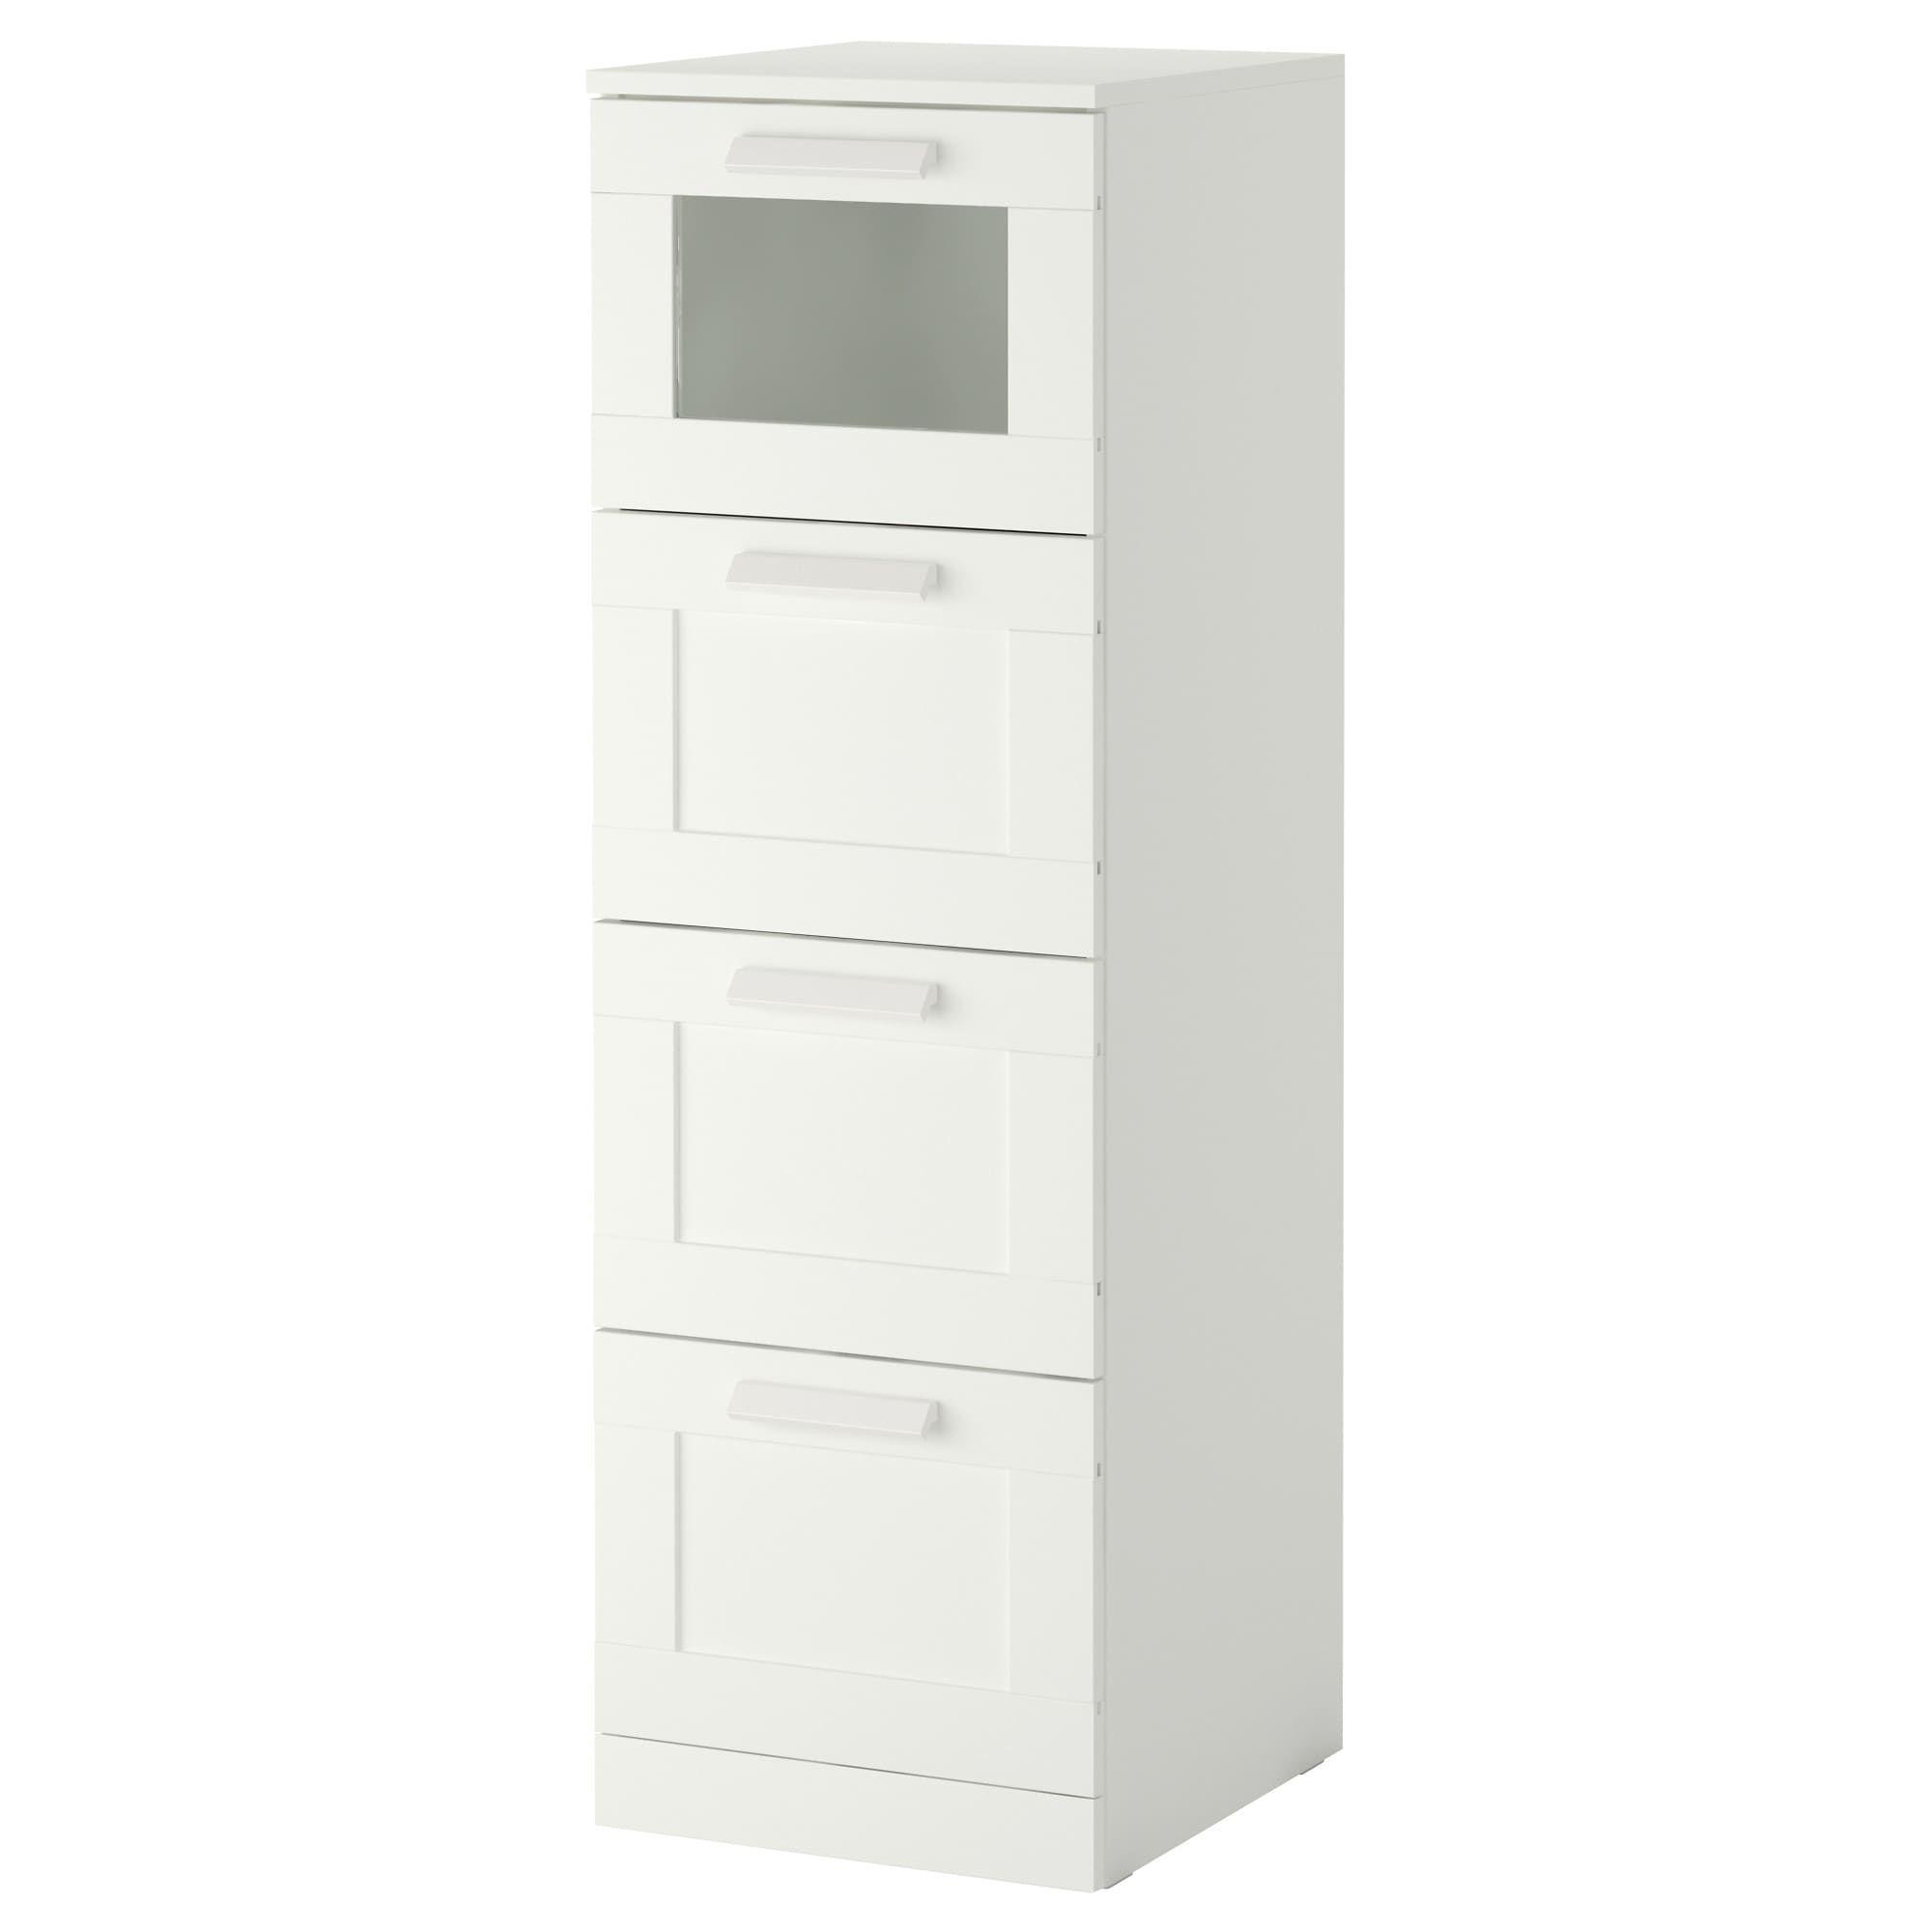 Home Furniture Store Modern Furnishings Decor Brimnes Ikea Drawers [ 2000 x 2000 Pixel ]